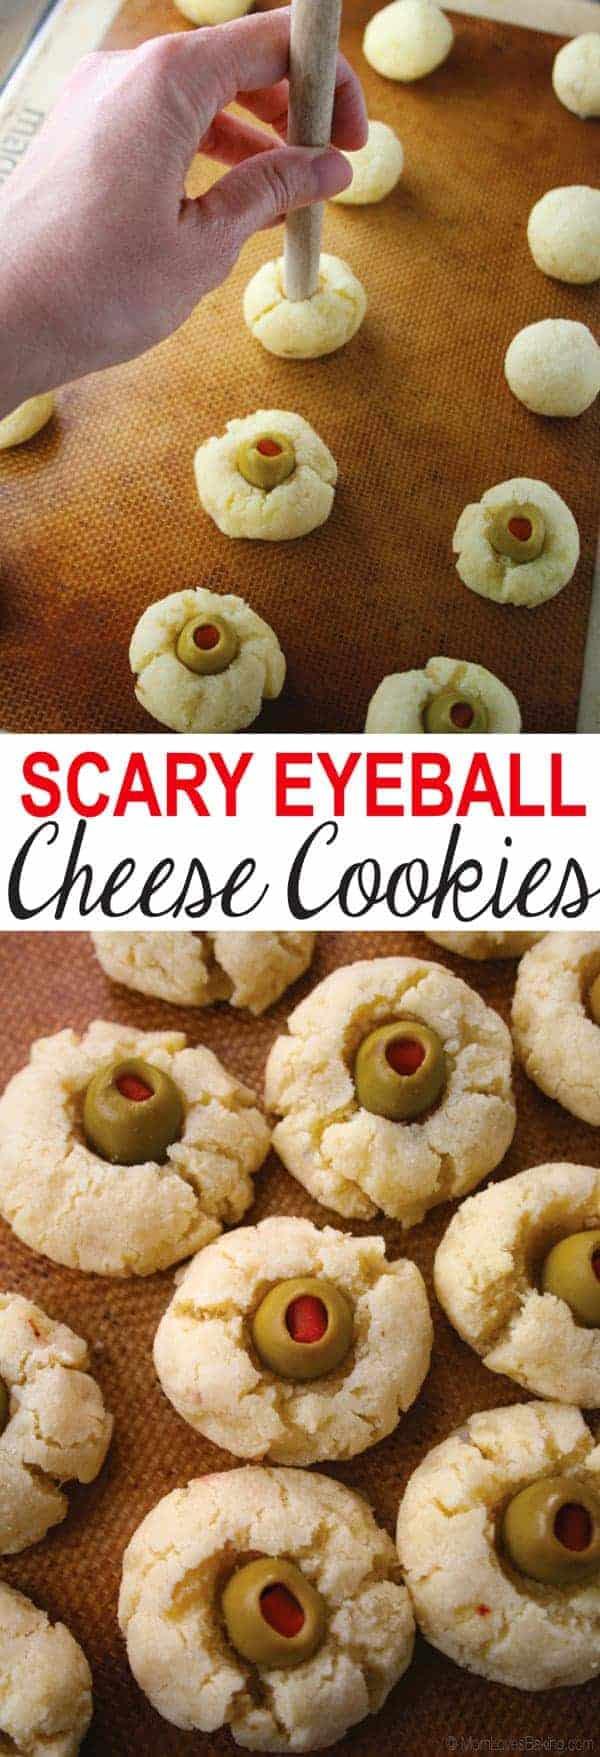 Scary Eyeball Cheese Cookies